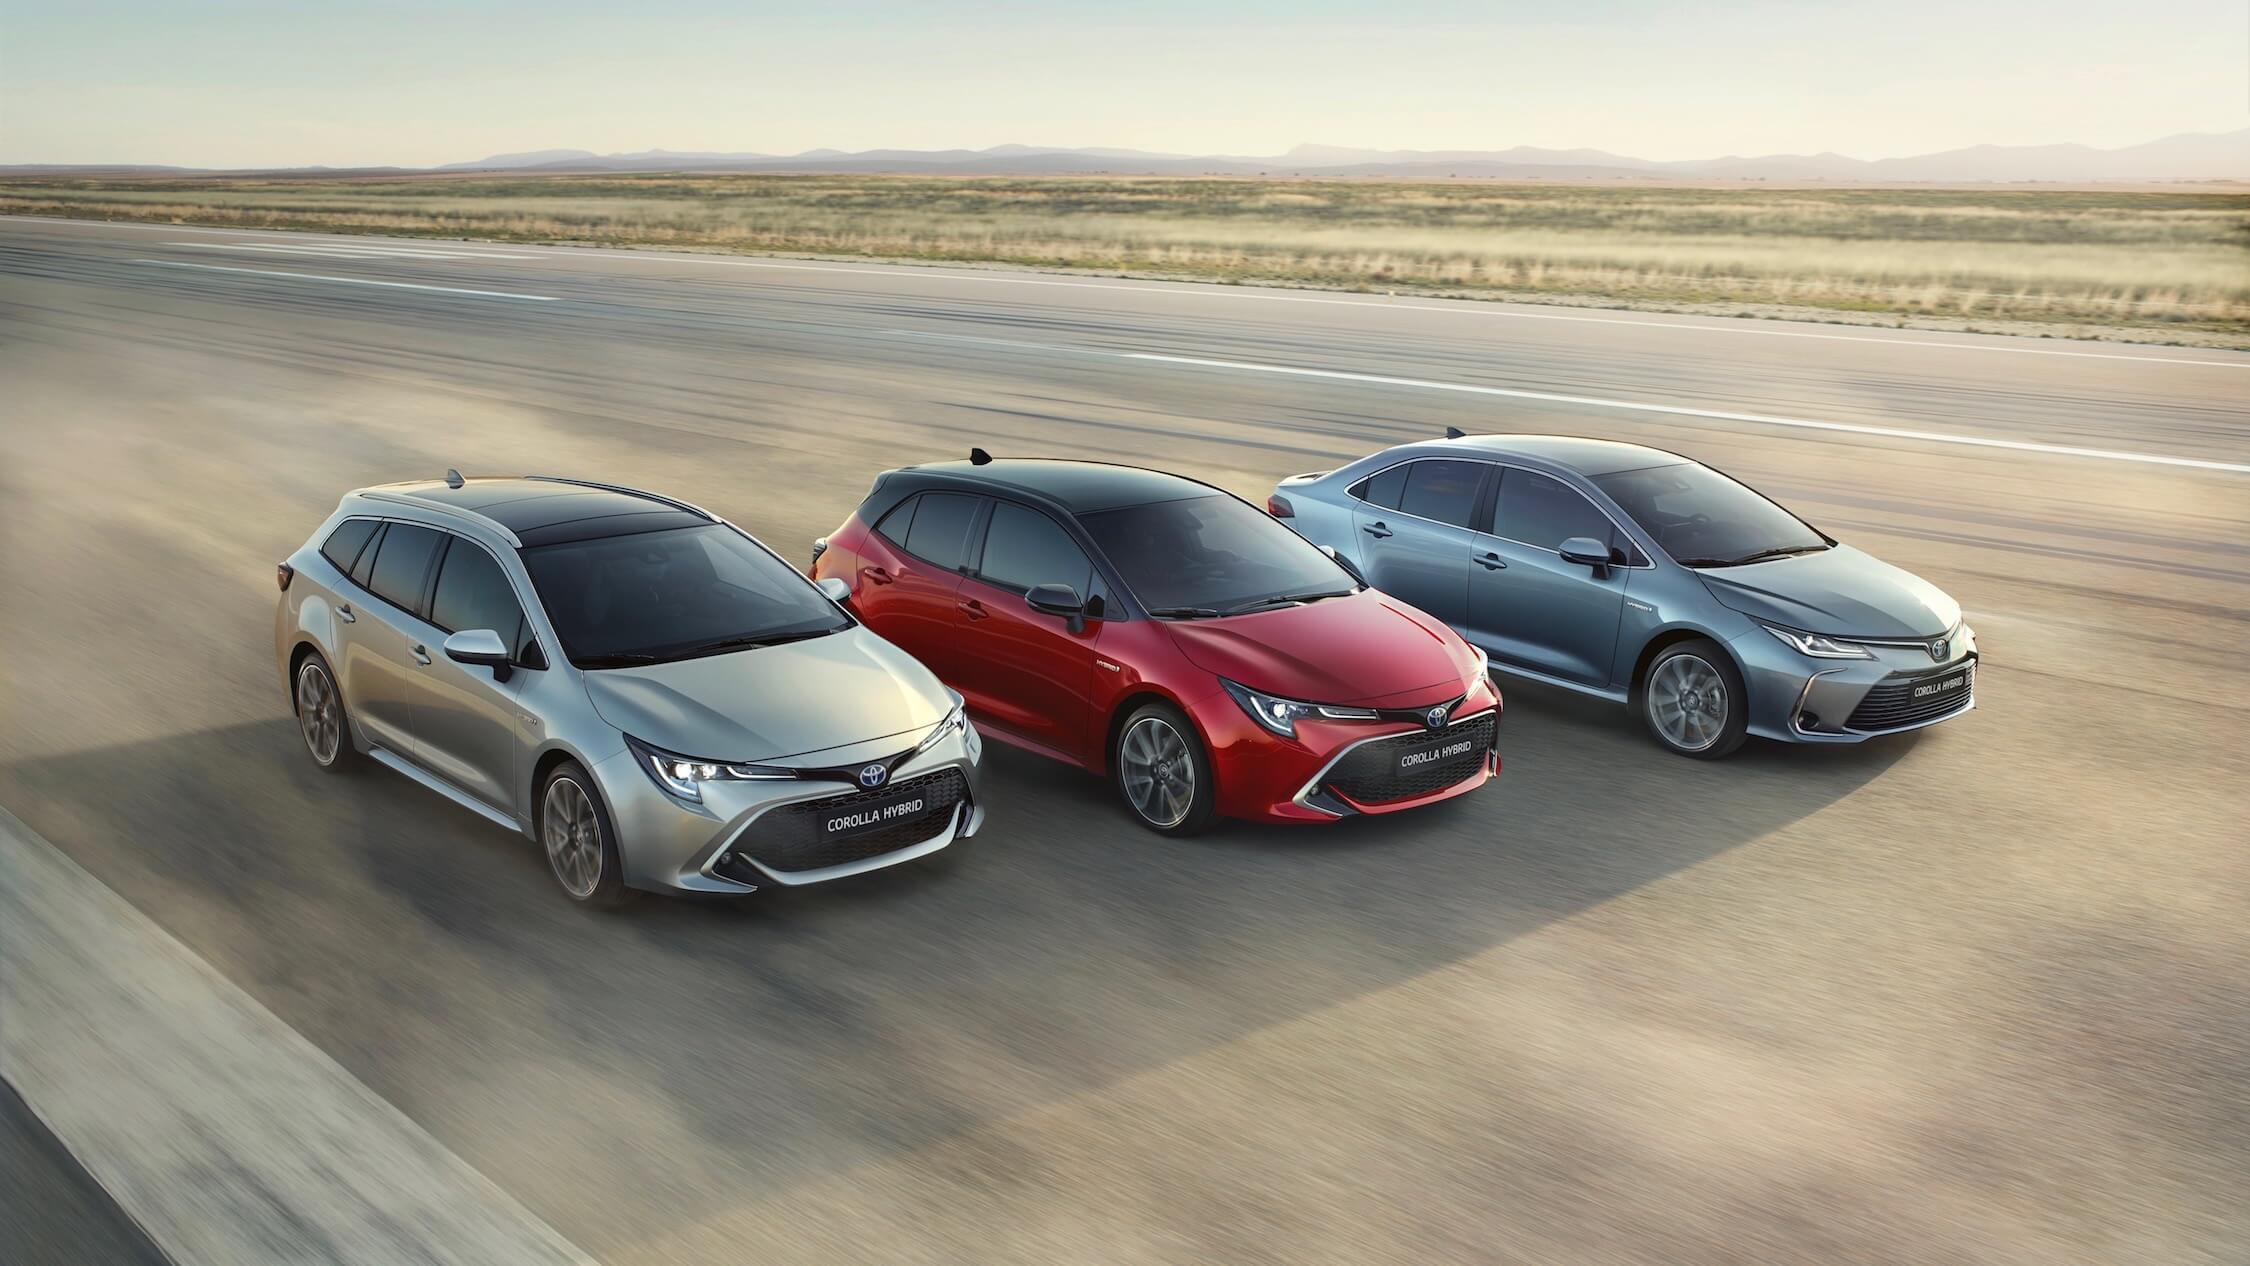 Toyota Corolla sedan touring hatchback